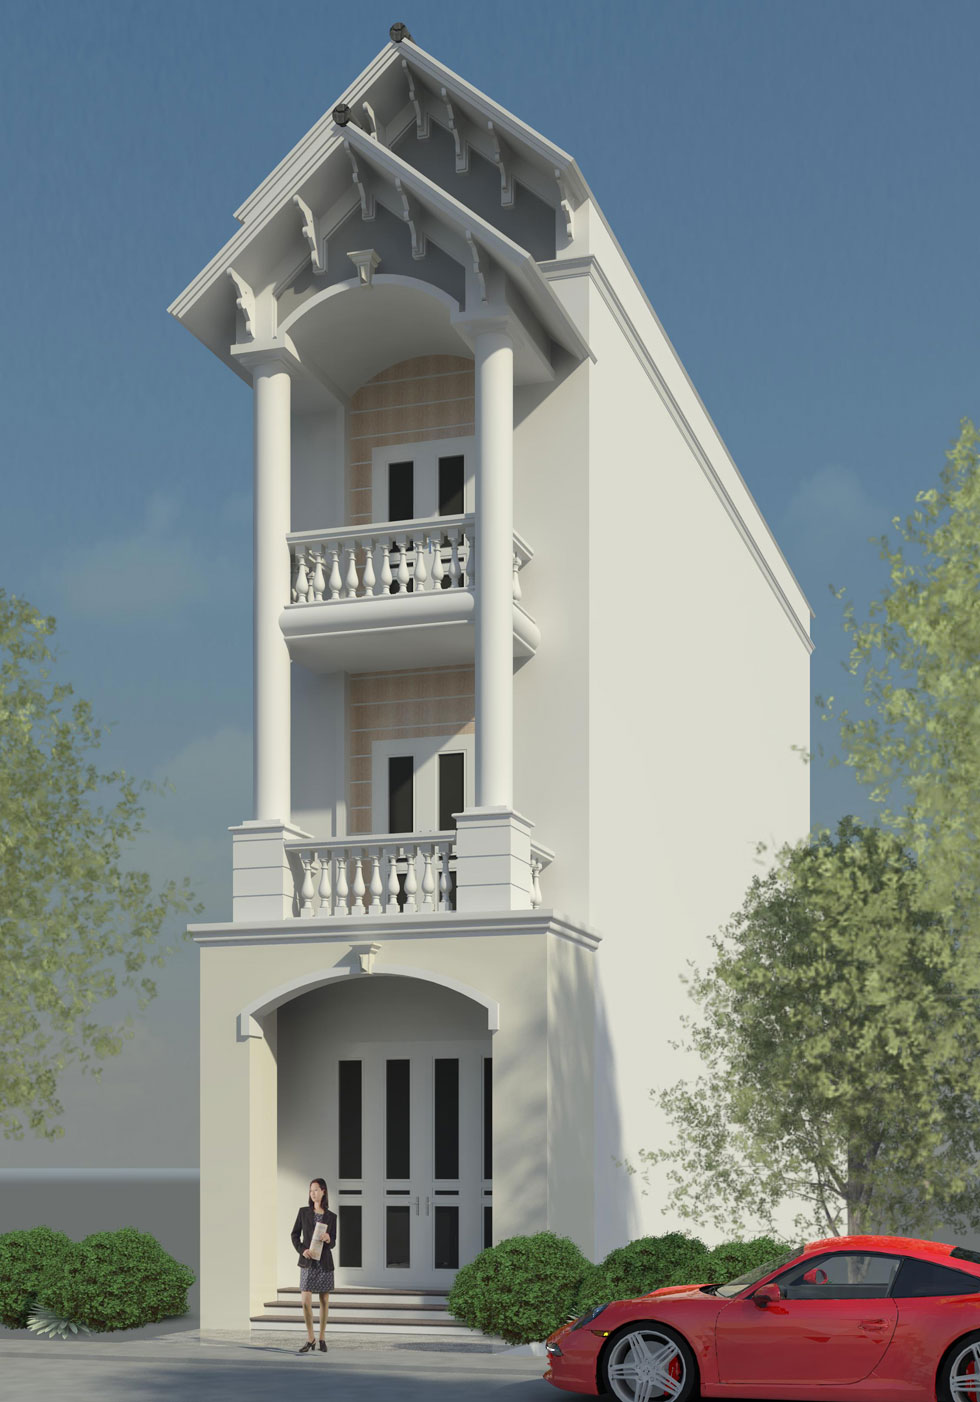 Kiến trúc ngoại thất